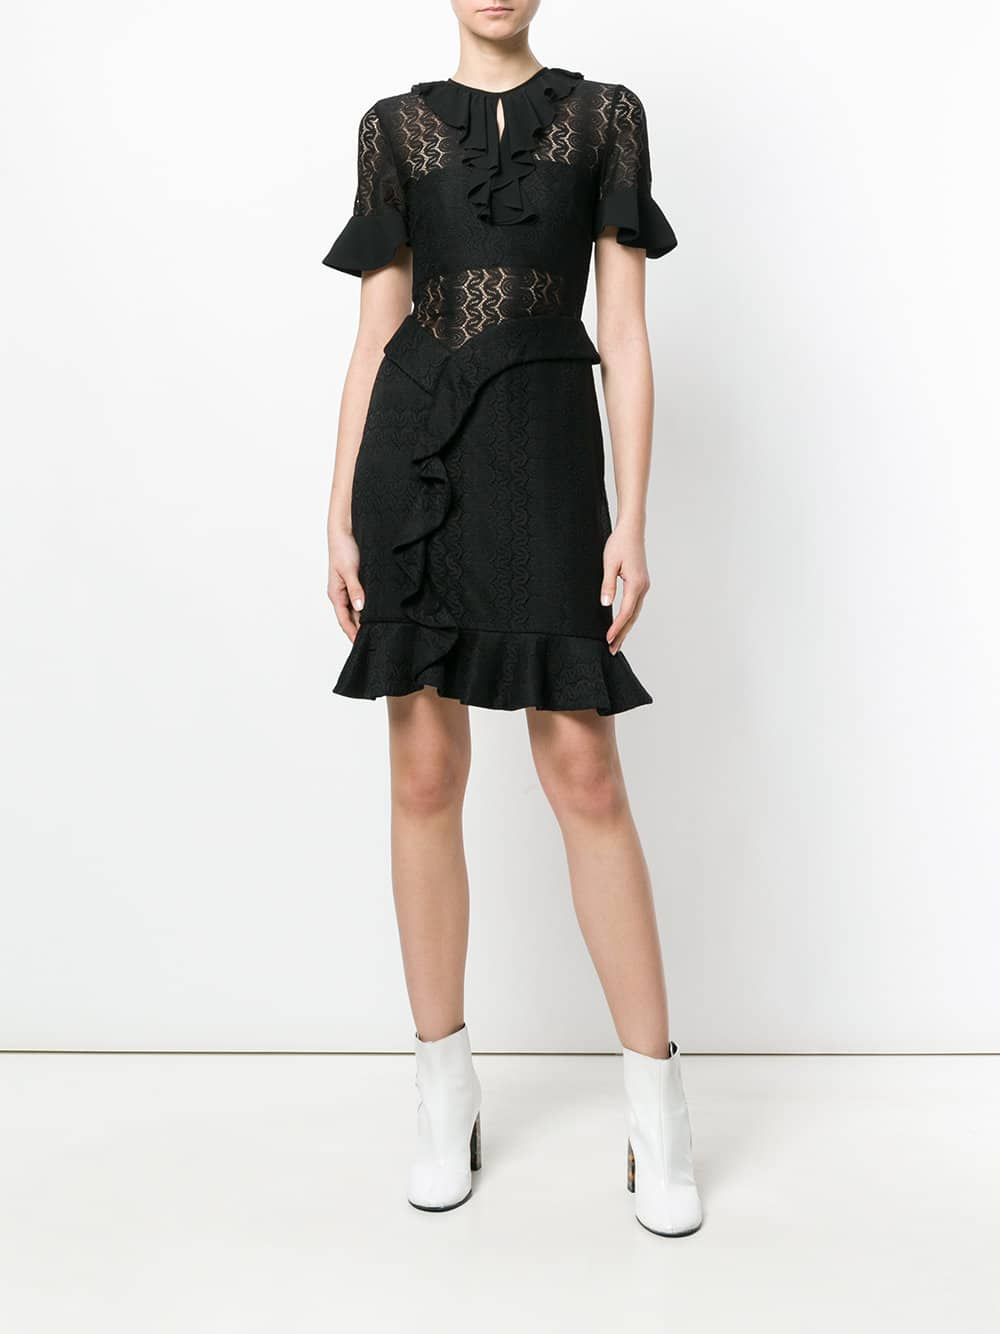 THREE FLOOR Alexa Black Dress